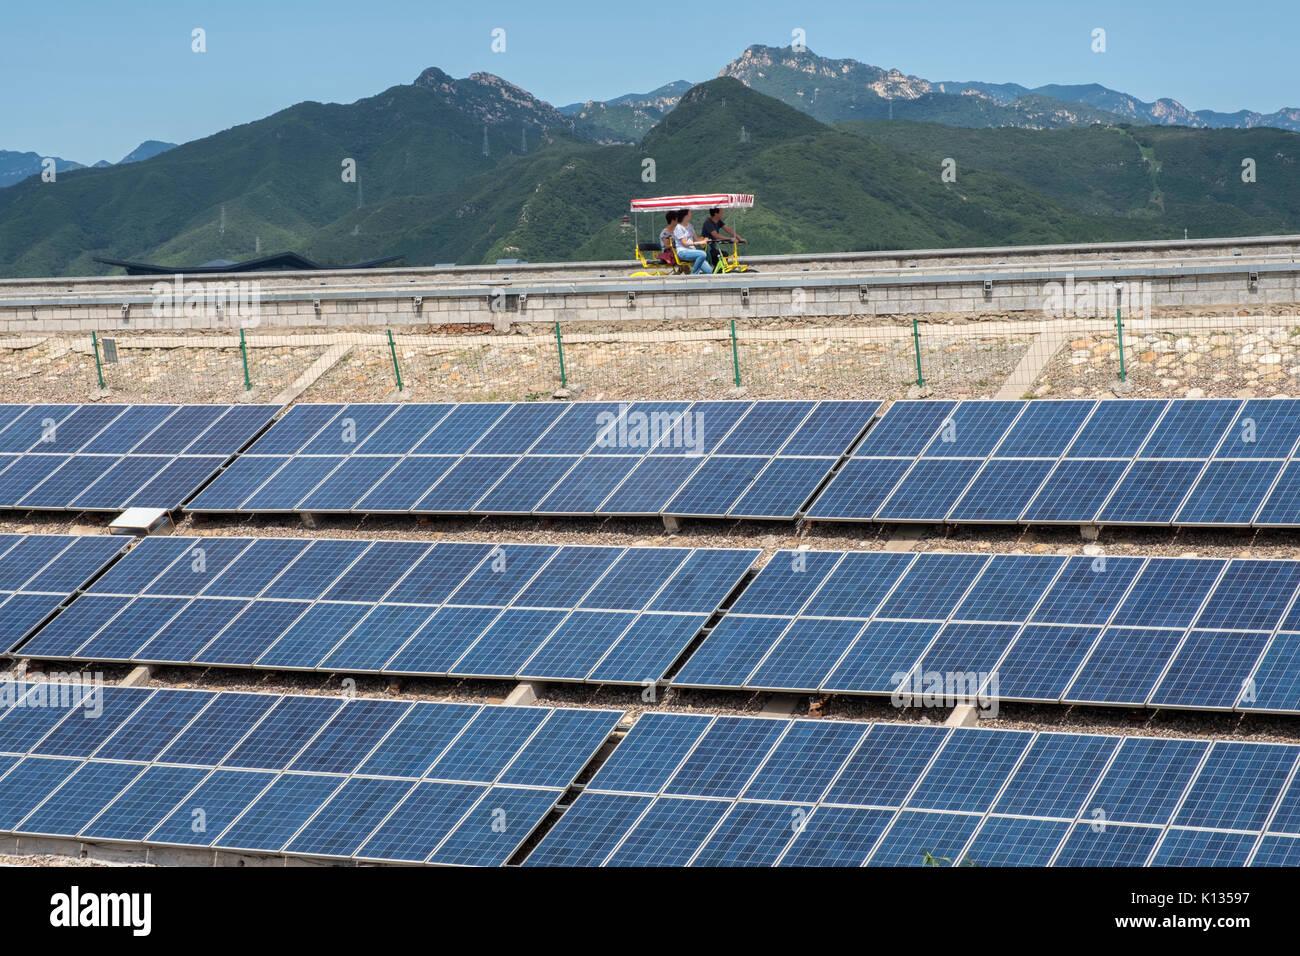 Photovoltaic solar panels on the dam of Yanqi Lake in Huairou, Beijing, China. 24-Aug-2017 - Stock Image